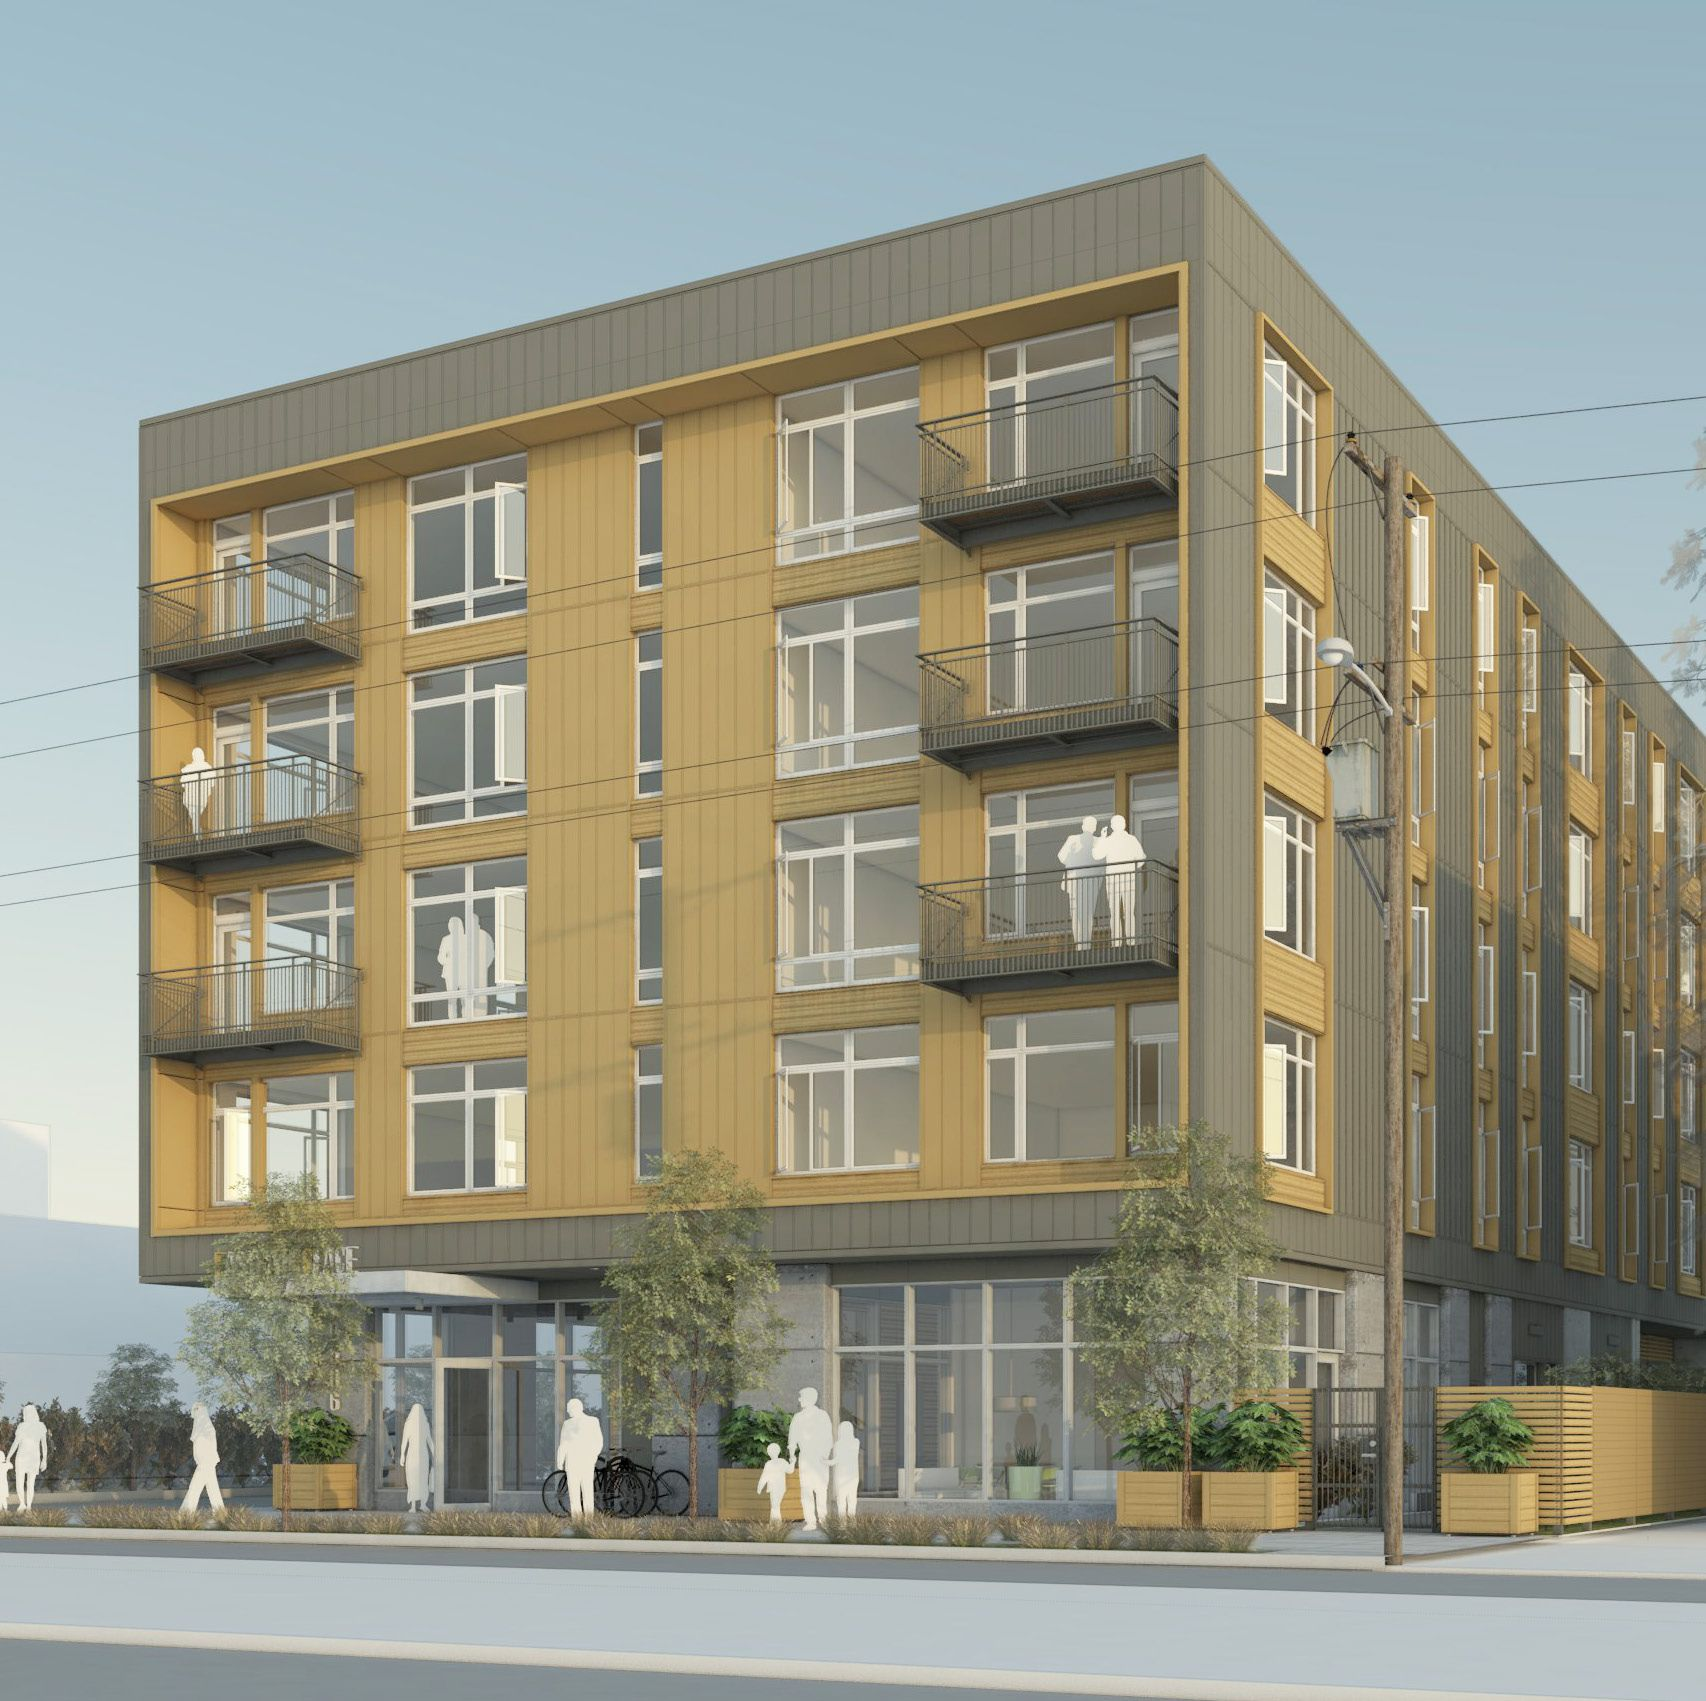 Apartments In Atlanta Ga Under 1200: 10506 E Burnside, Ankrom Moisan Architects, Portland, OR